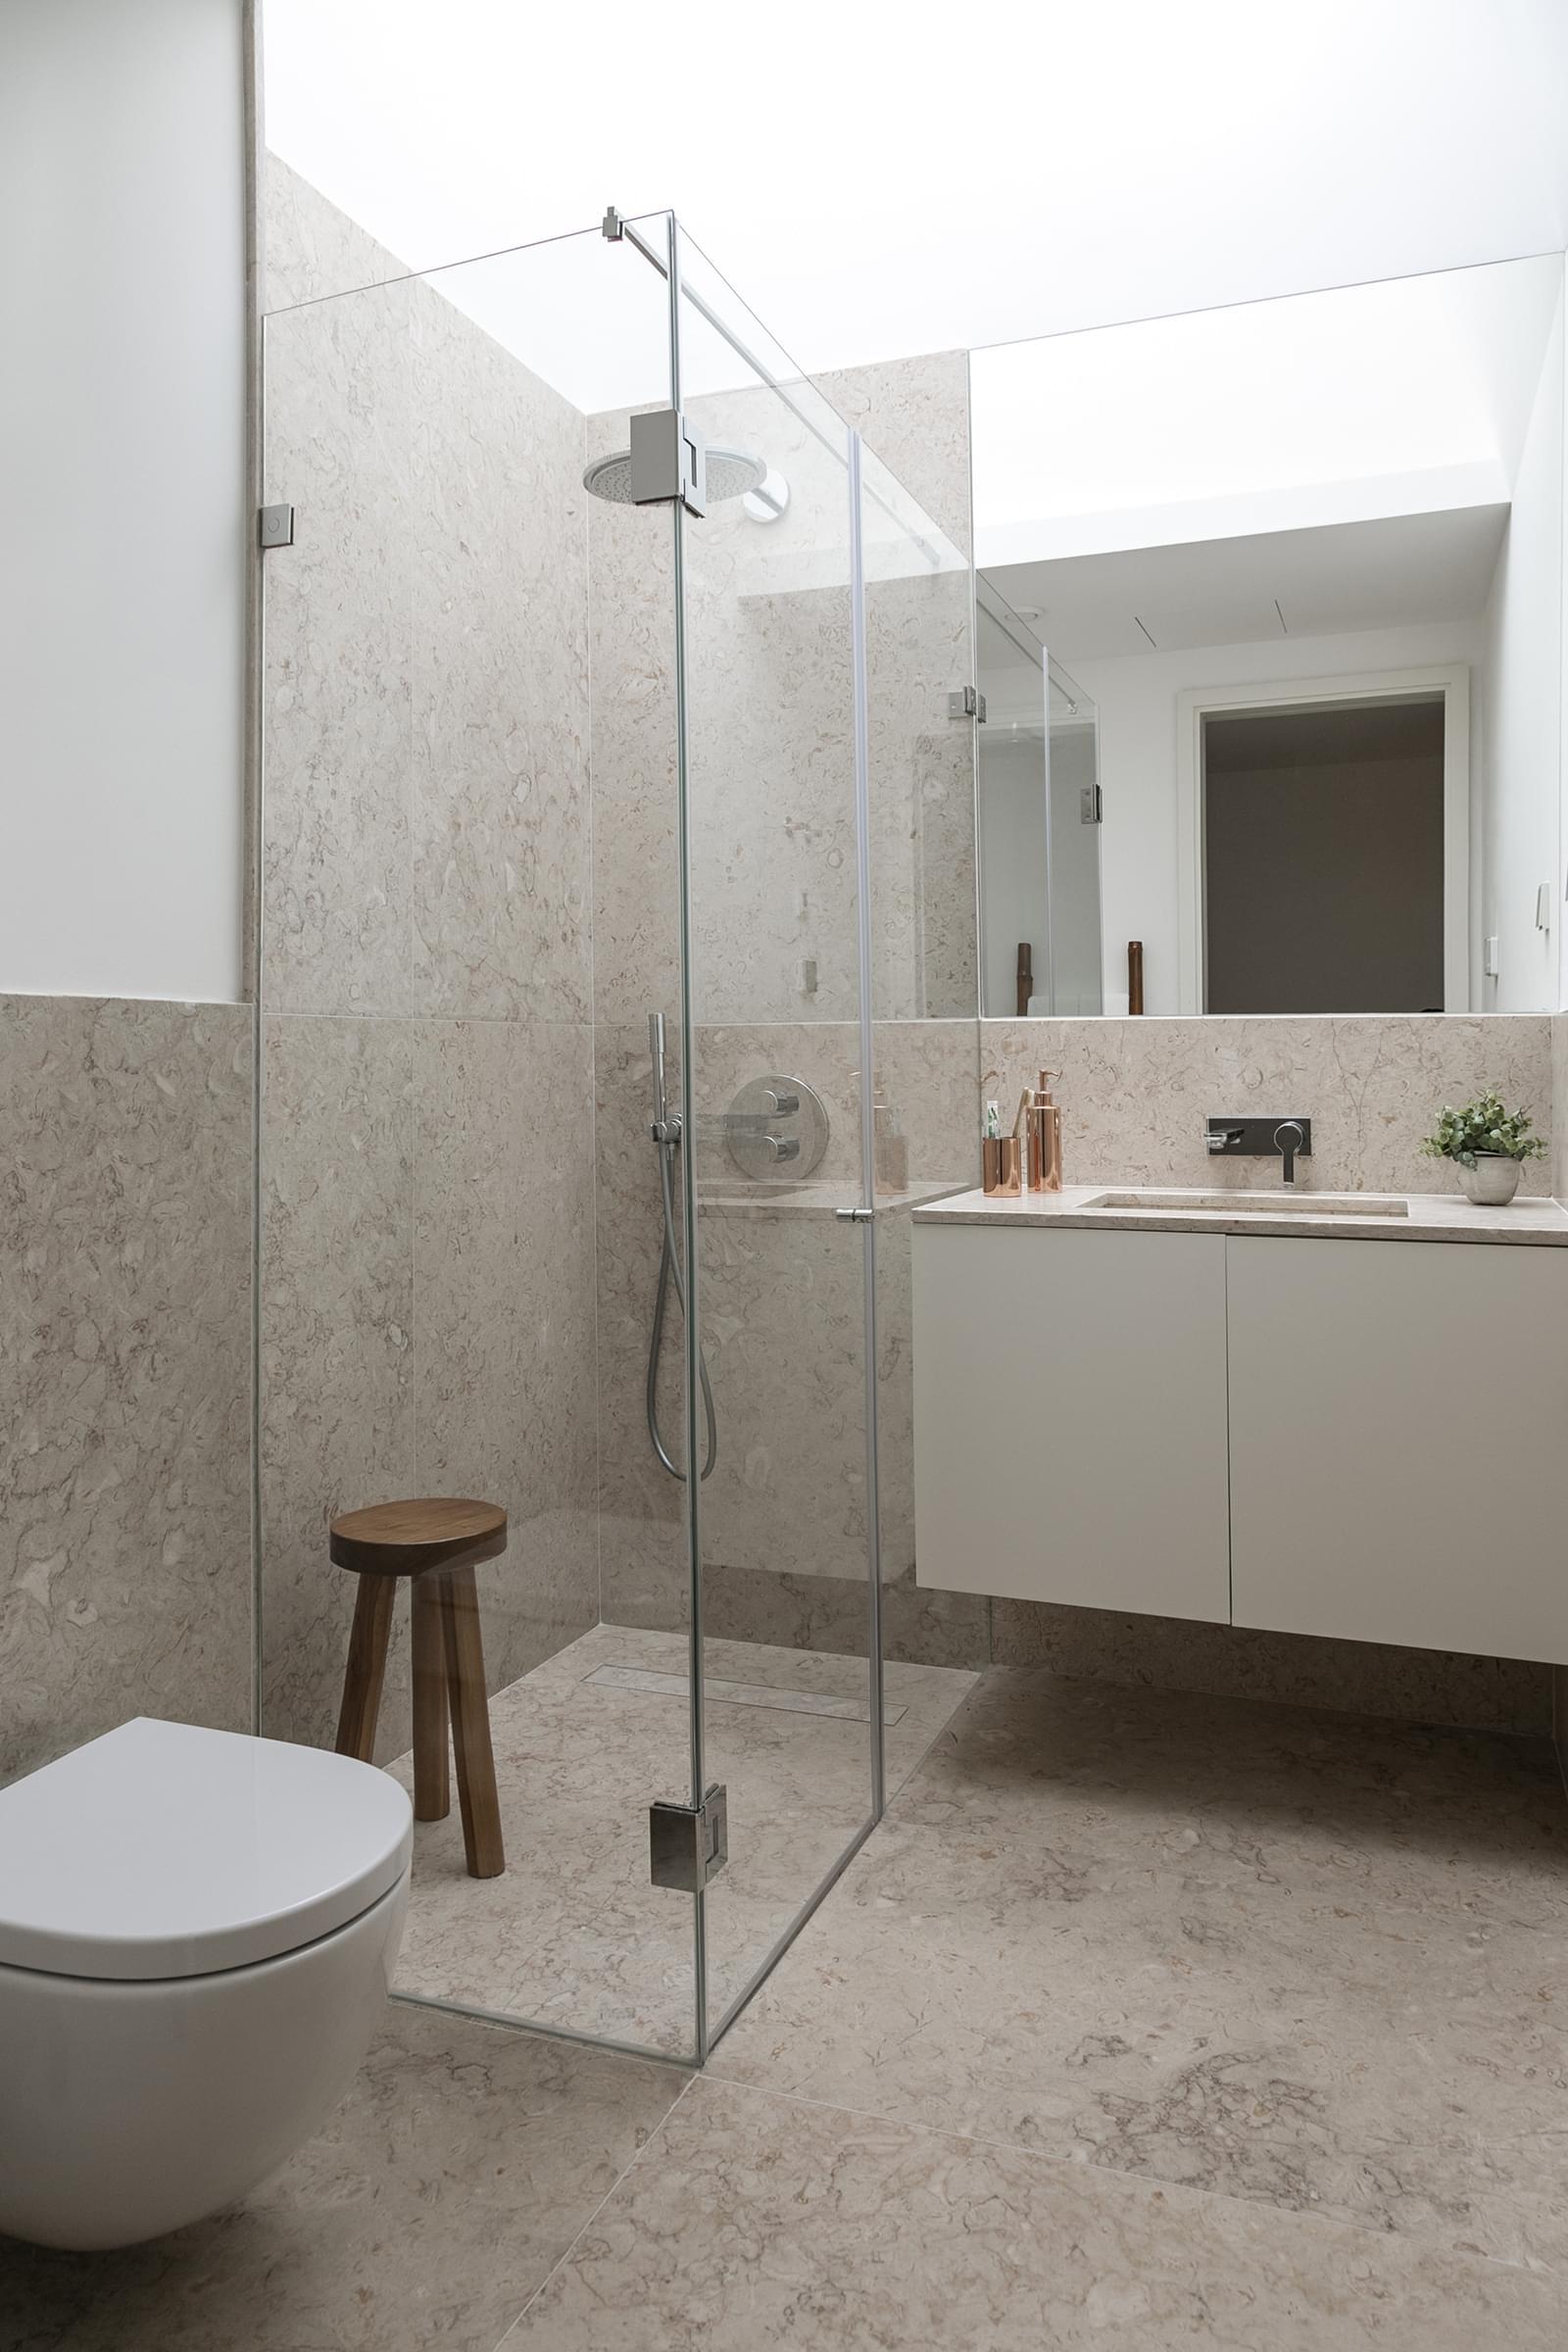 PF24026, Apartamento T2 + 1, Lisboa